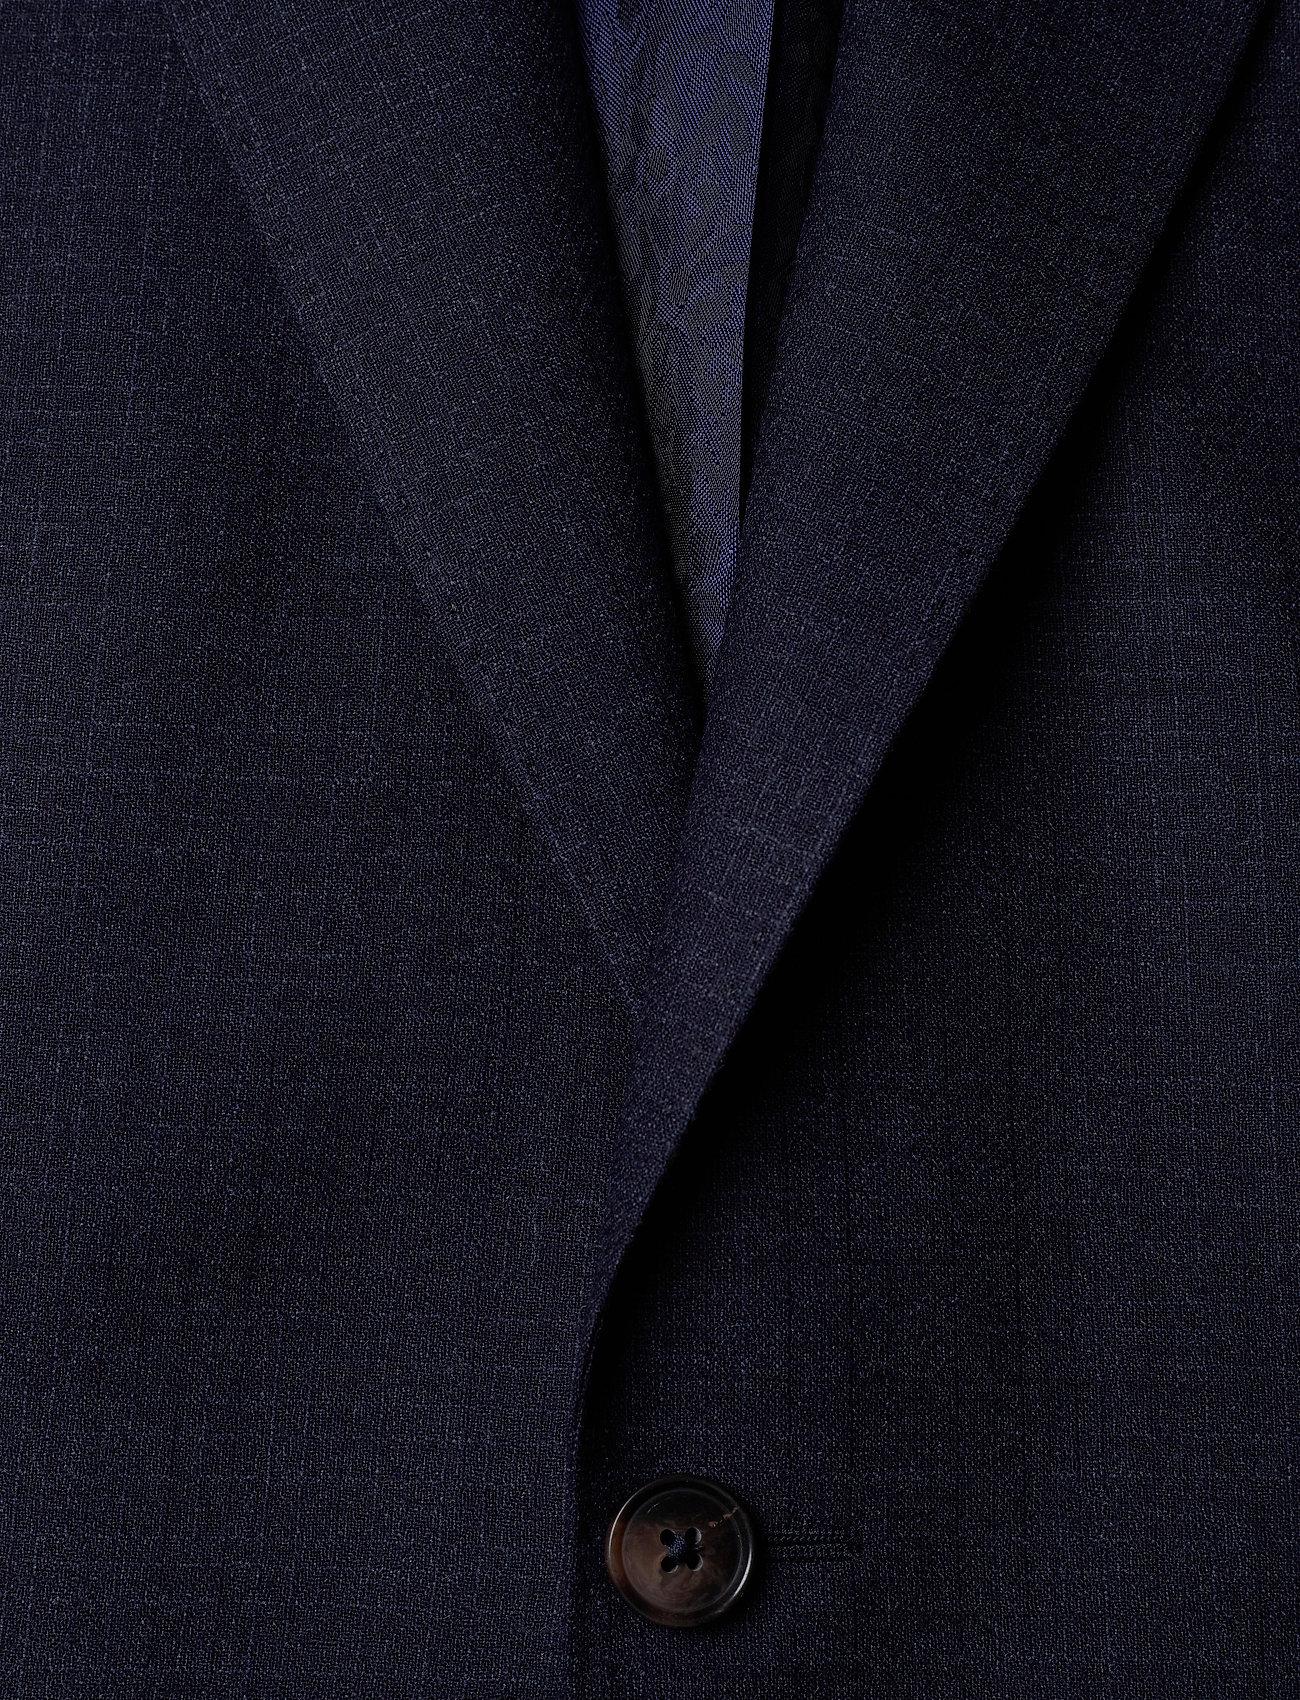 SAND 1821 - Star Napoli-Craig Normal - Dresser & blazere DARK BLUE/NAVY - Menn Klær